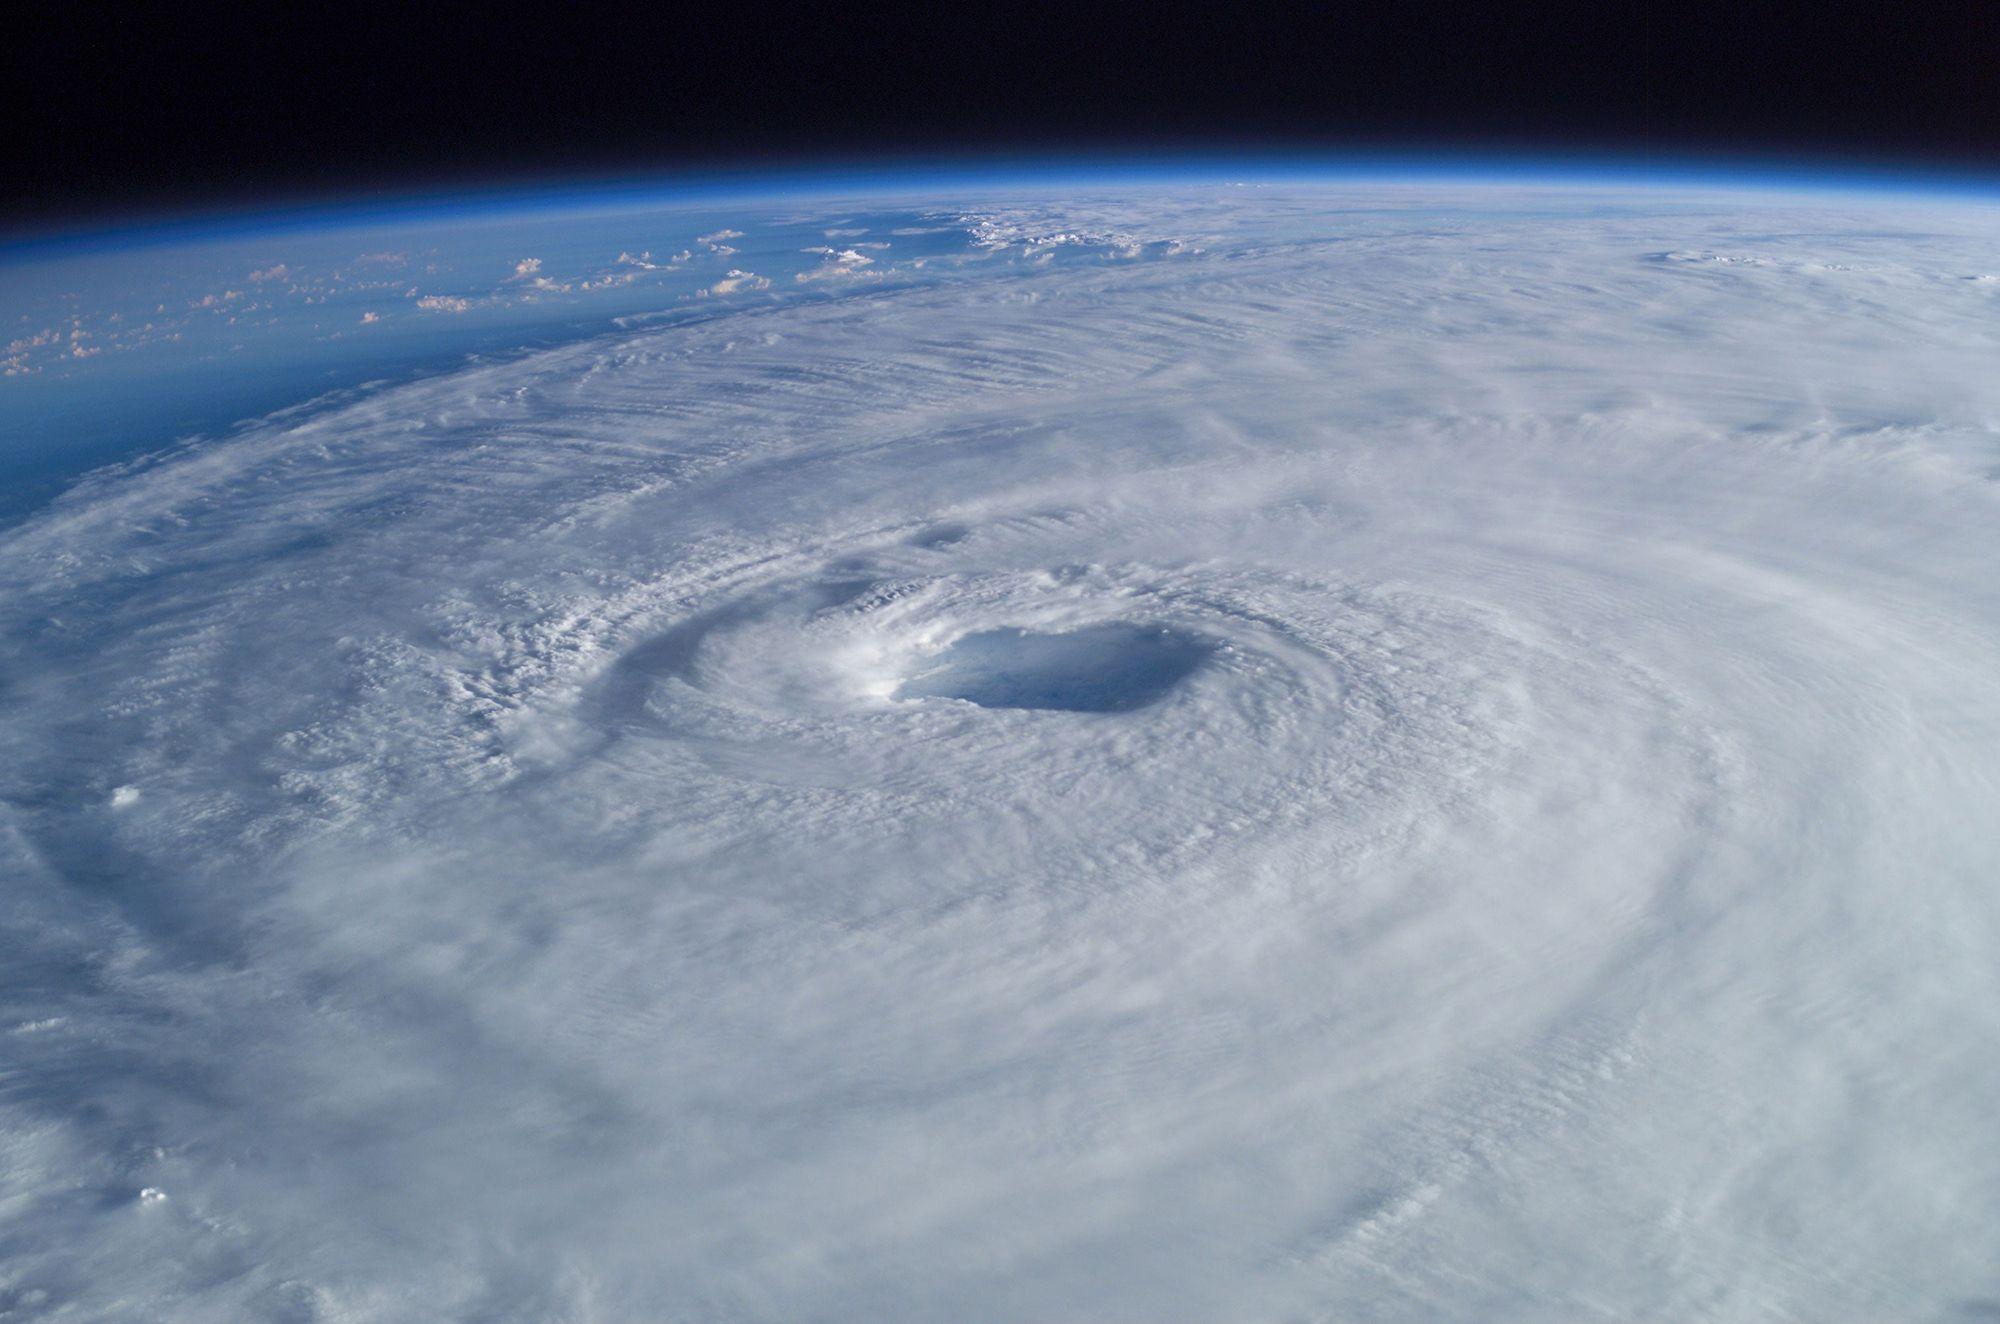 Global Warming Fueling Fewer But Stronger Hurricanes Study Says Hurricane Images Hurricane Season Eye Of The Storm